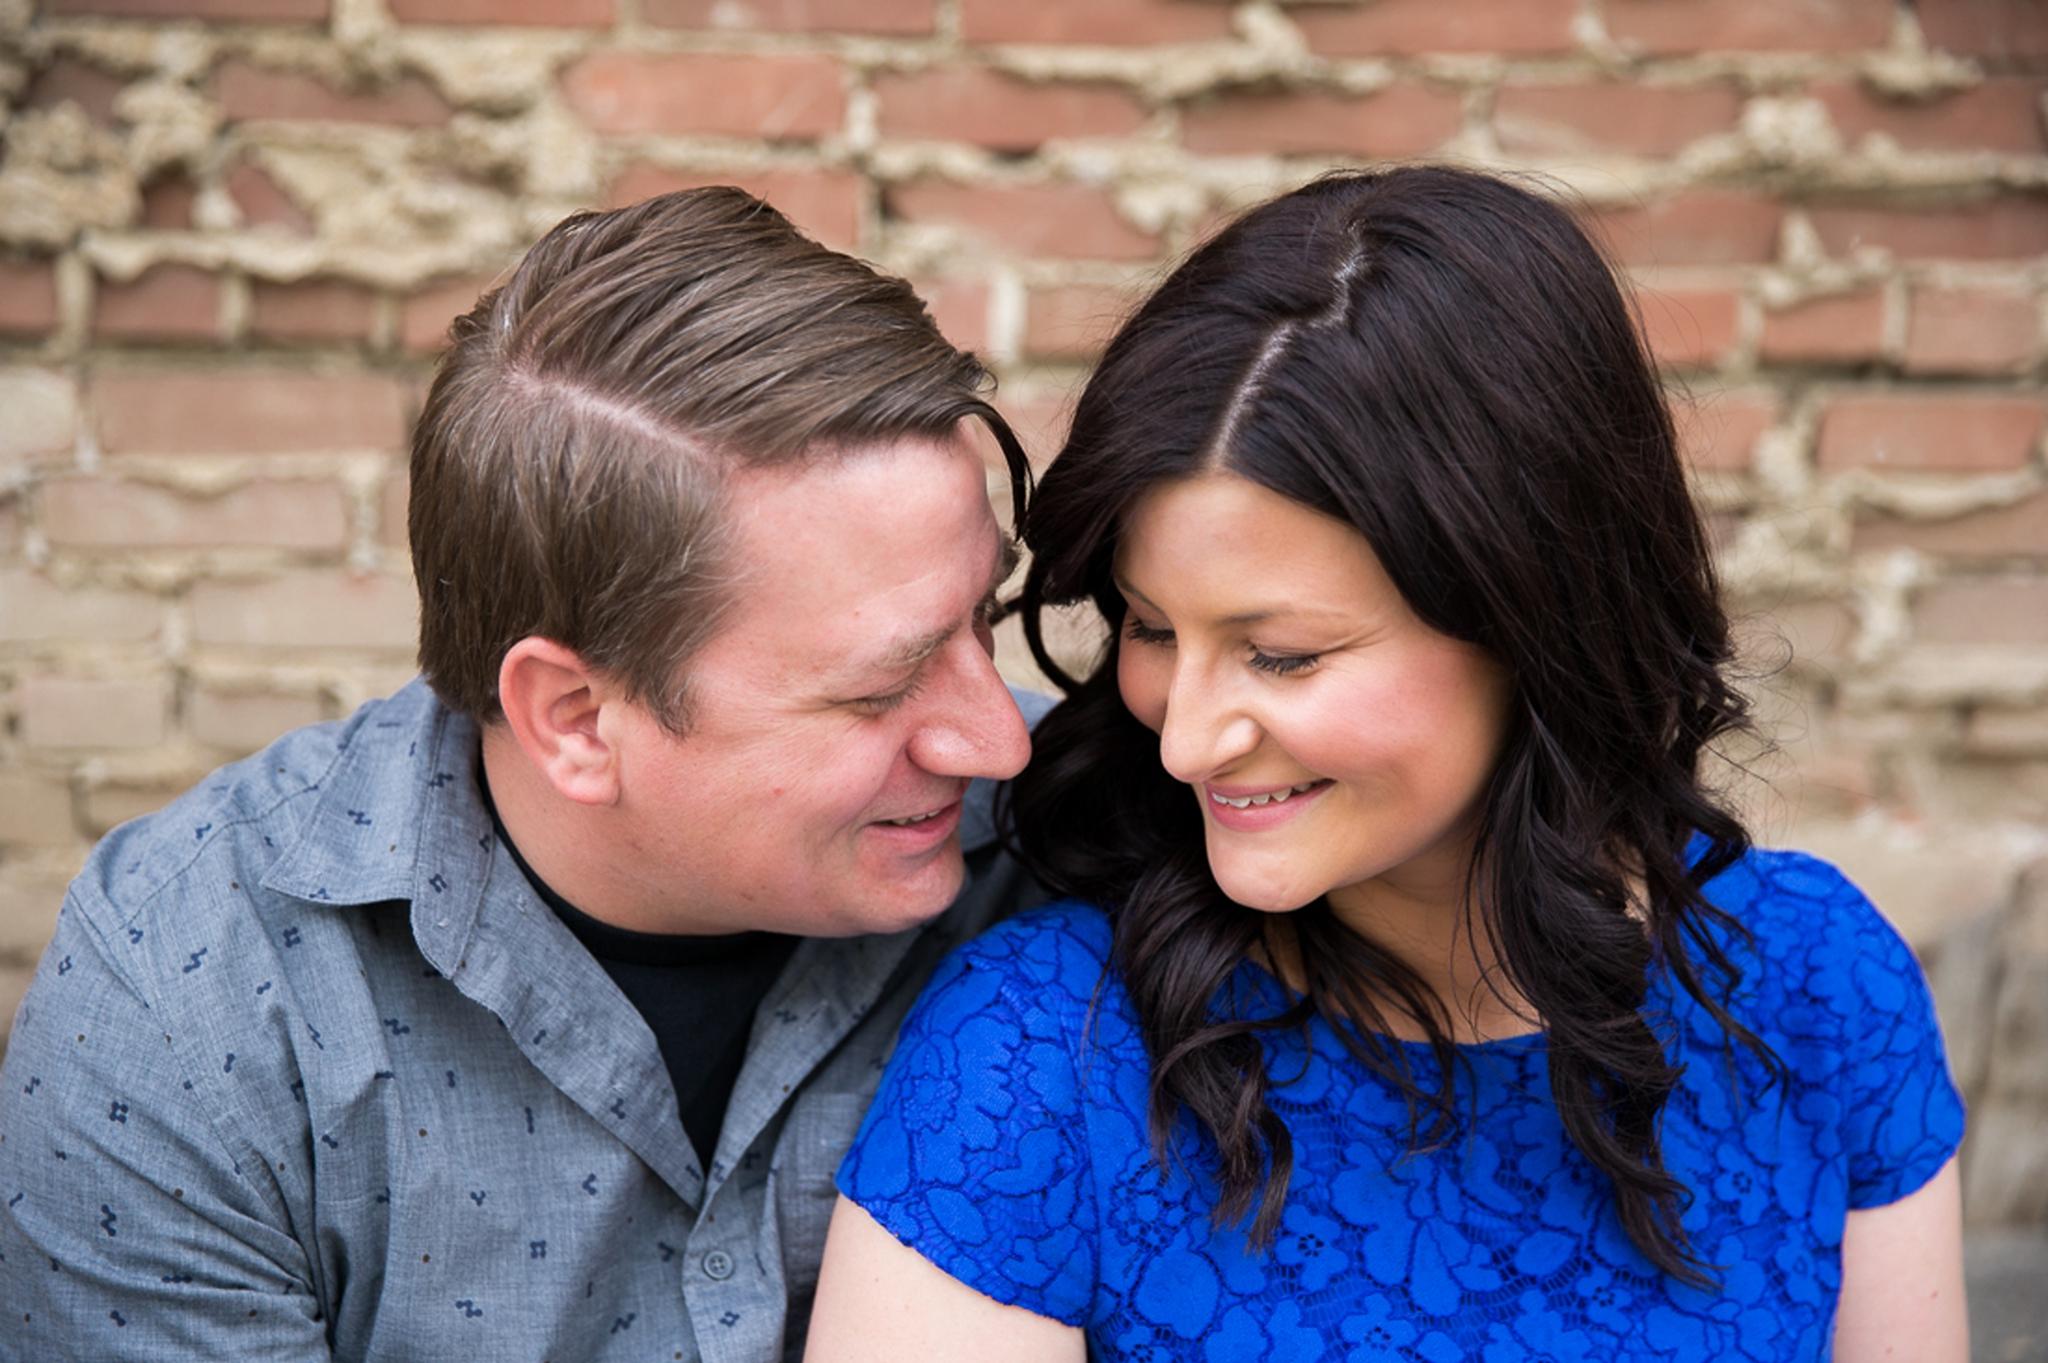 Edmonton Wedding Photographers - Alison & Shawn's Engagement Session